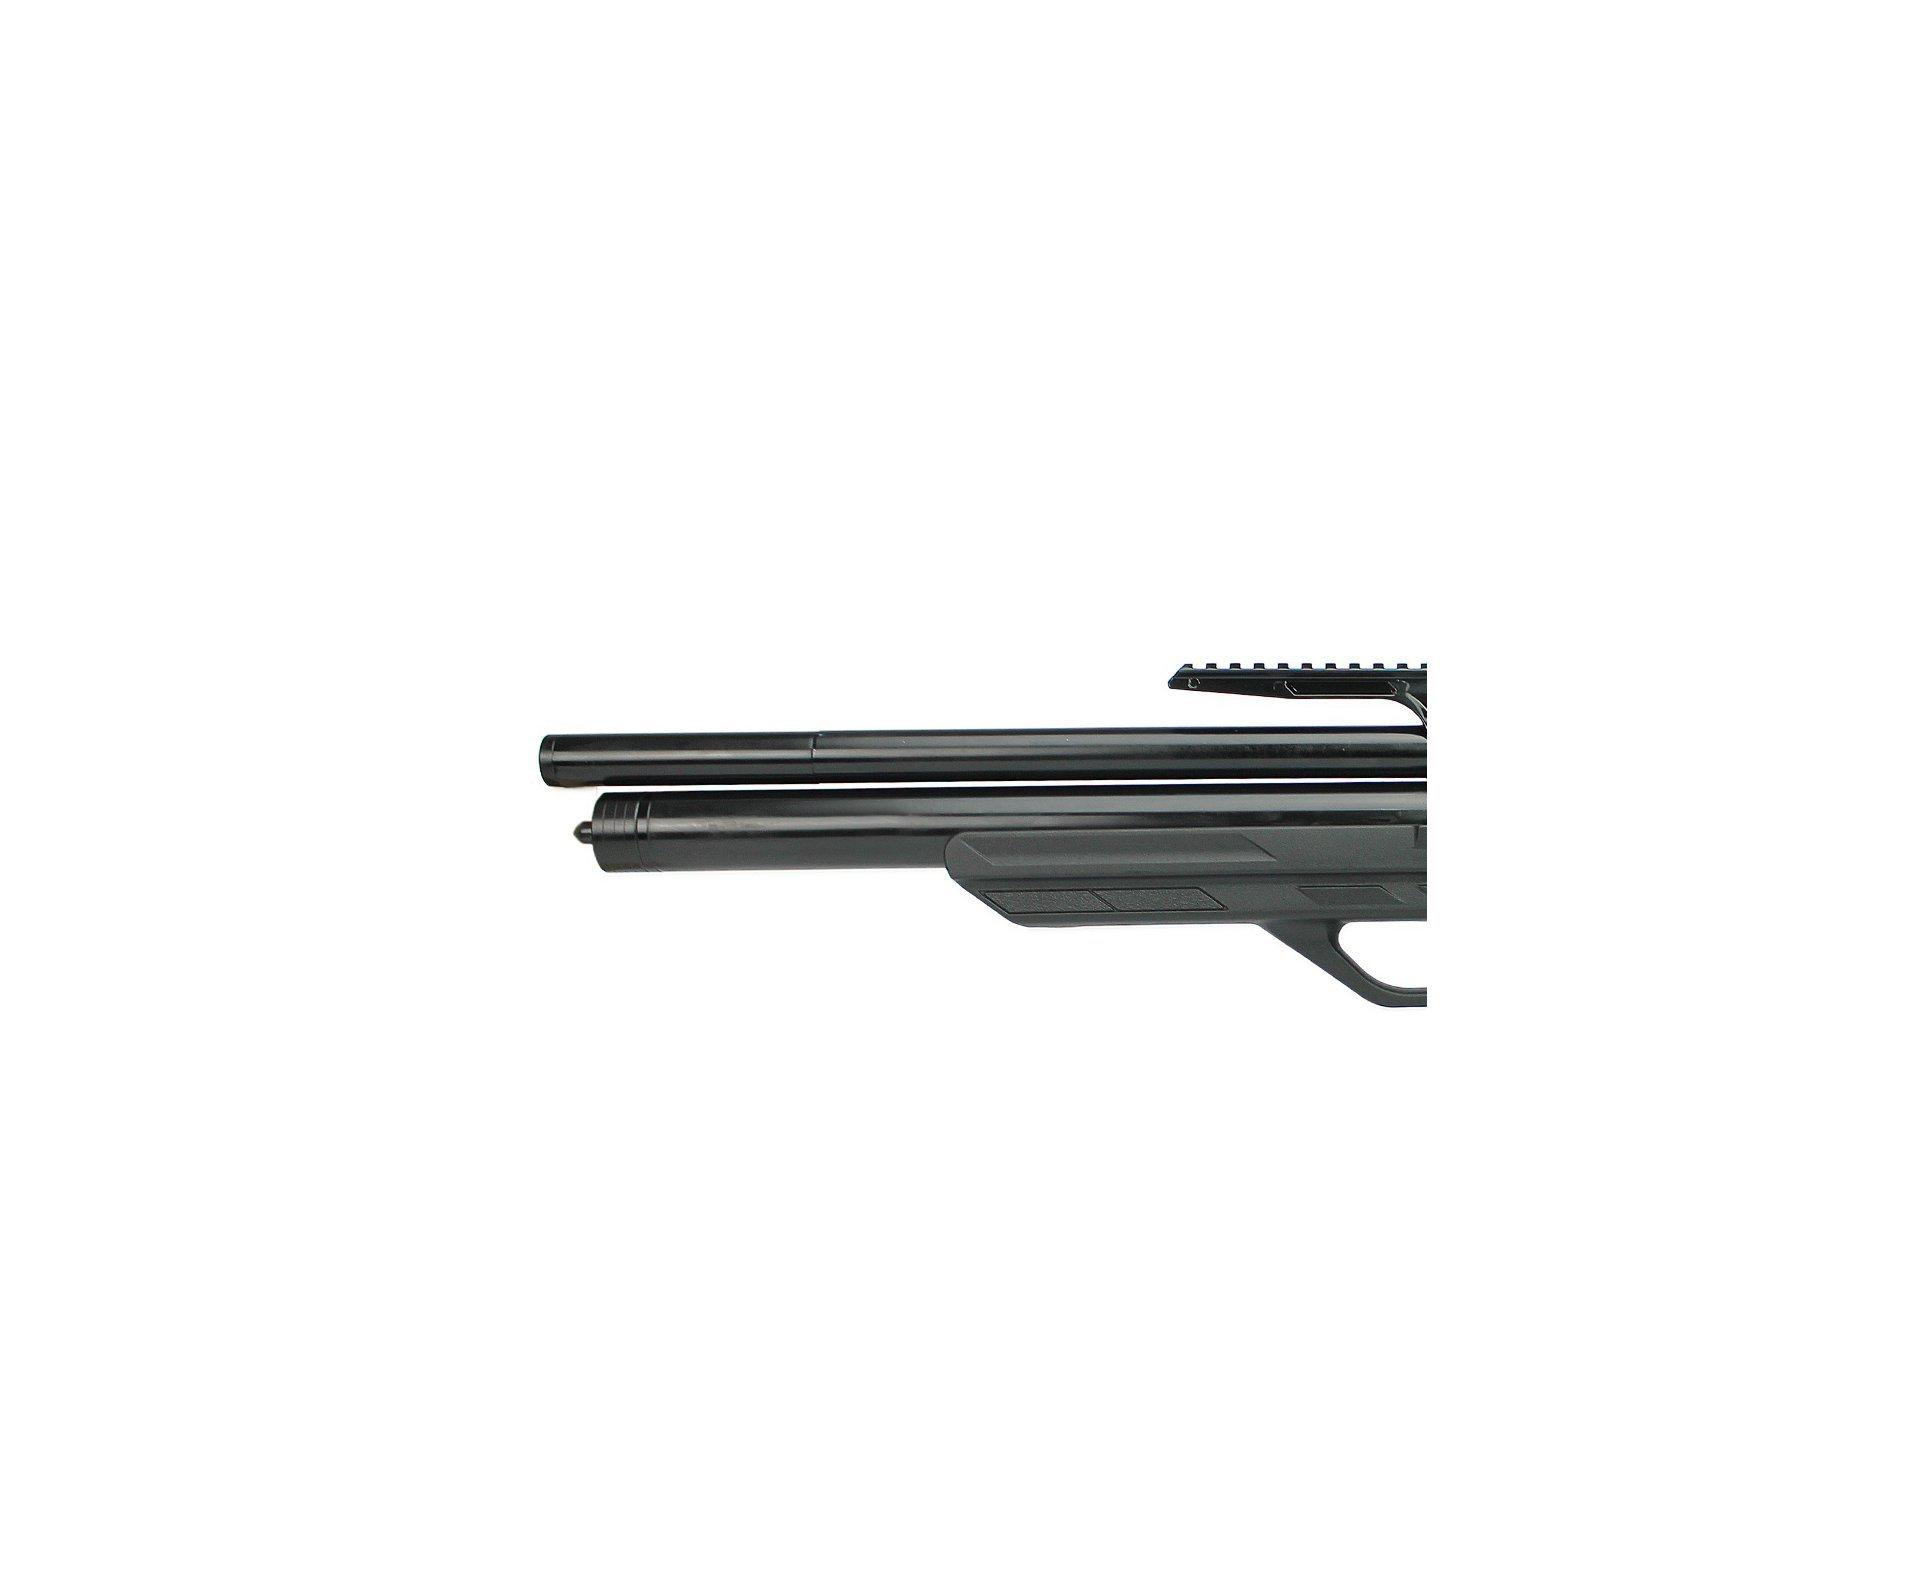 Artefato de Pressão PCP MX10-S Syntethic Black Regulated 5.5mm Aselkon